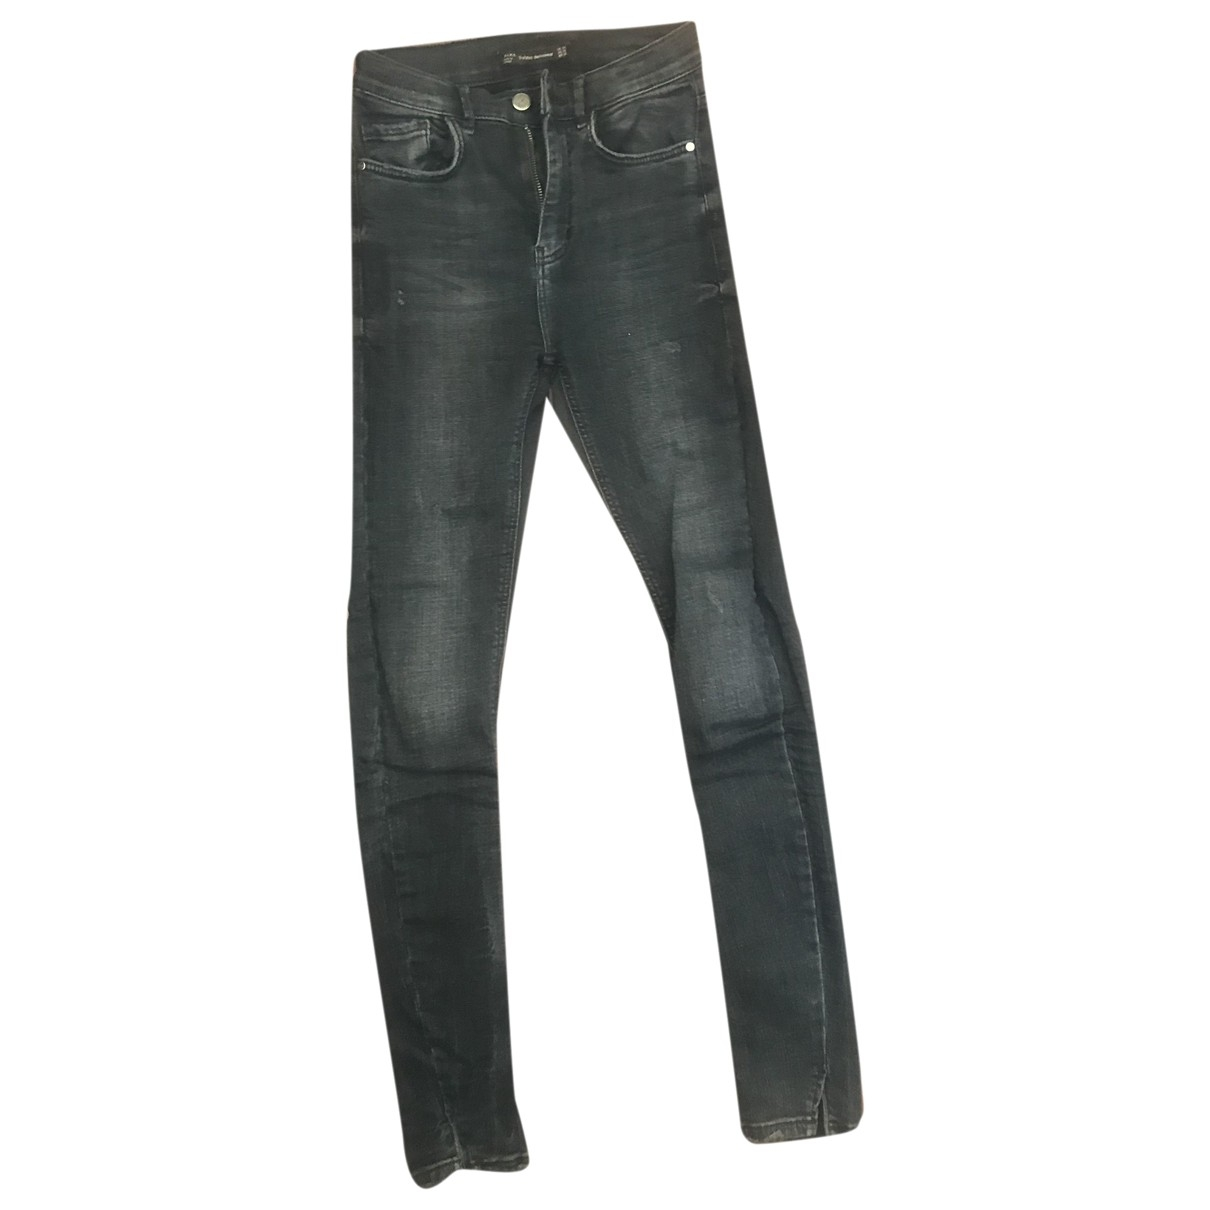 Zara \N Grey Cotton - elasthane Jeans for Women 34 FR